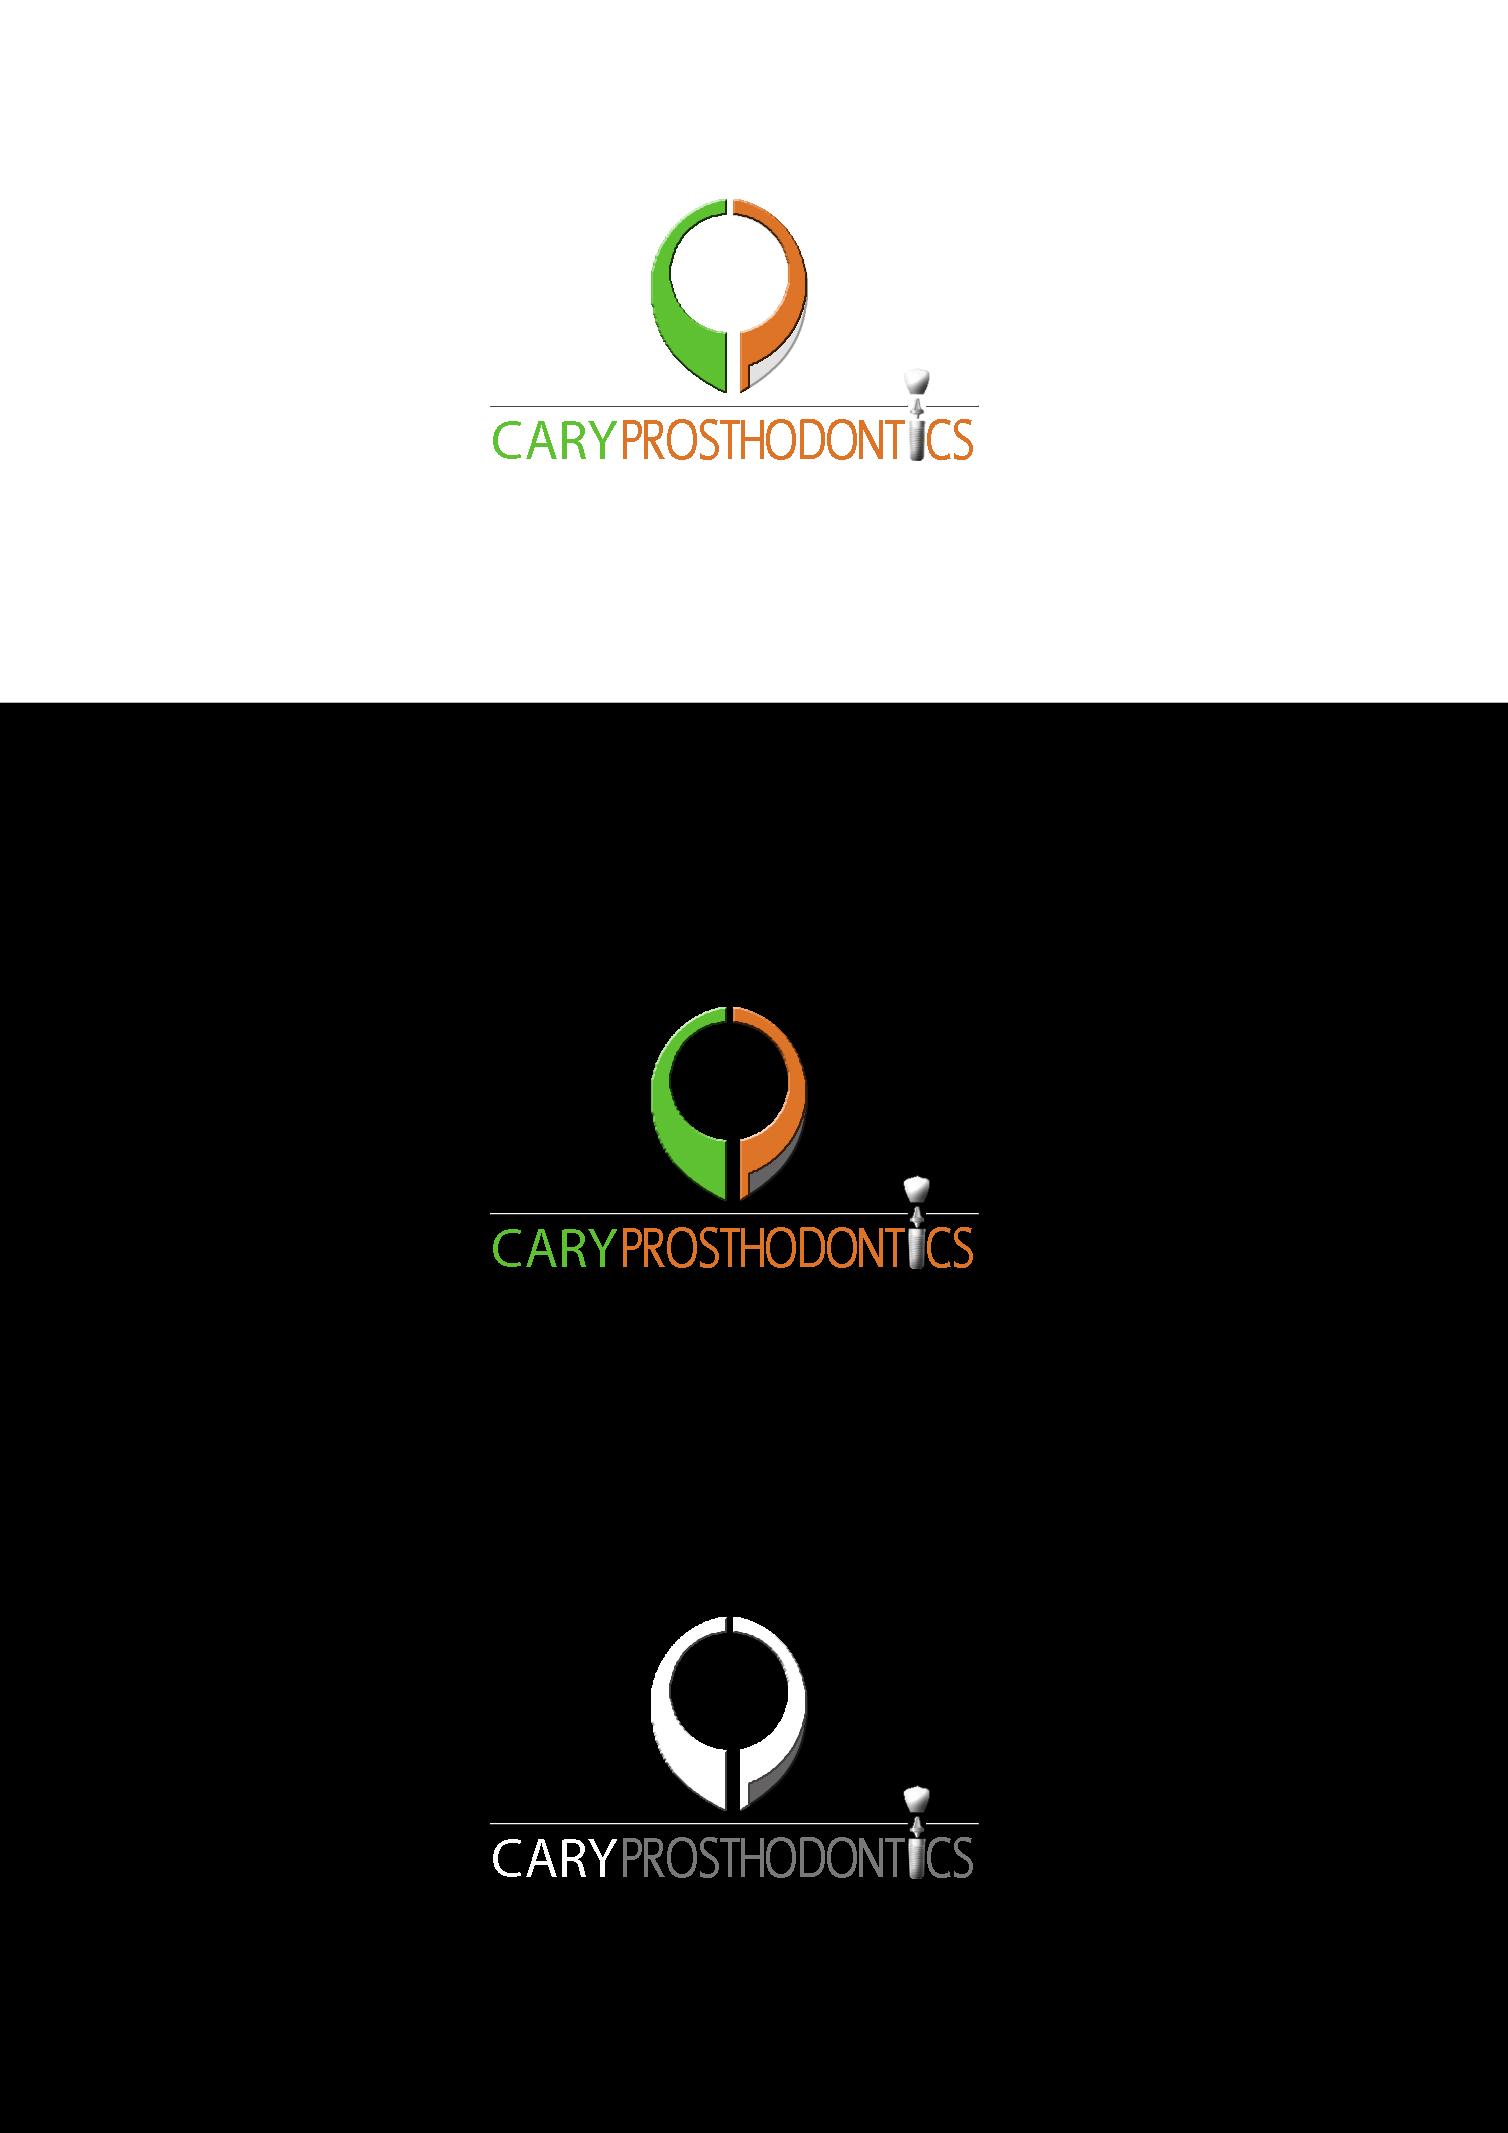 Logo Design by JSDESIGNGROUP - Entry No. 151 in the Logo Design Contest Cary Prosthodontics Logo Design.